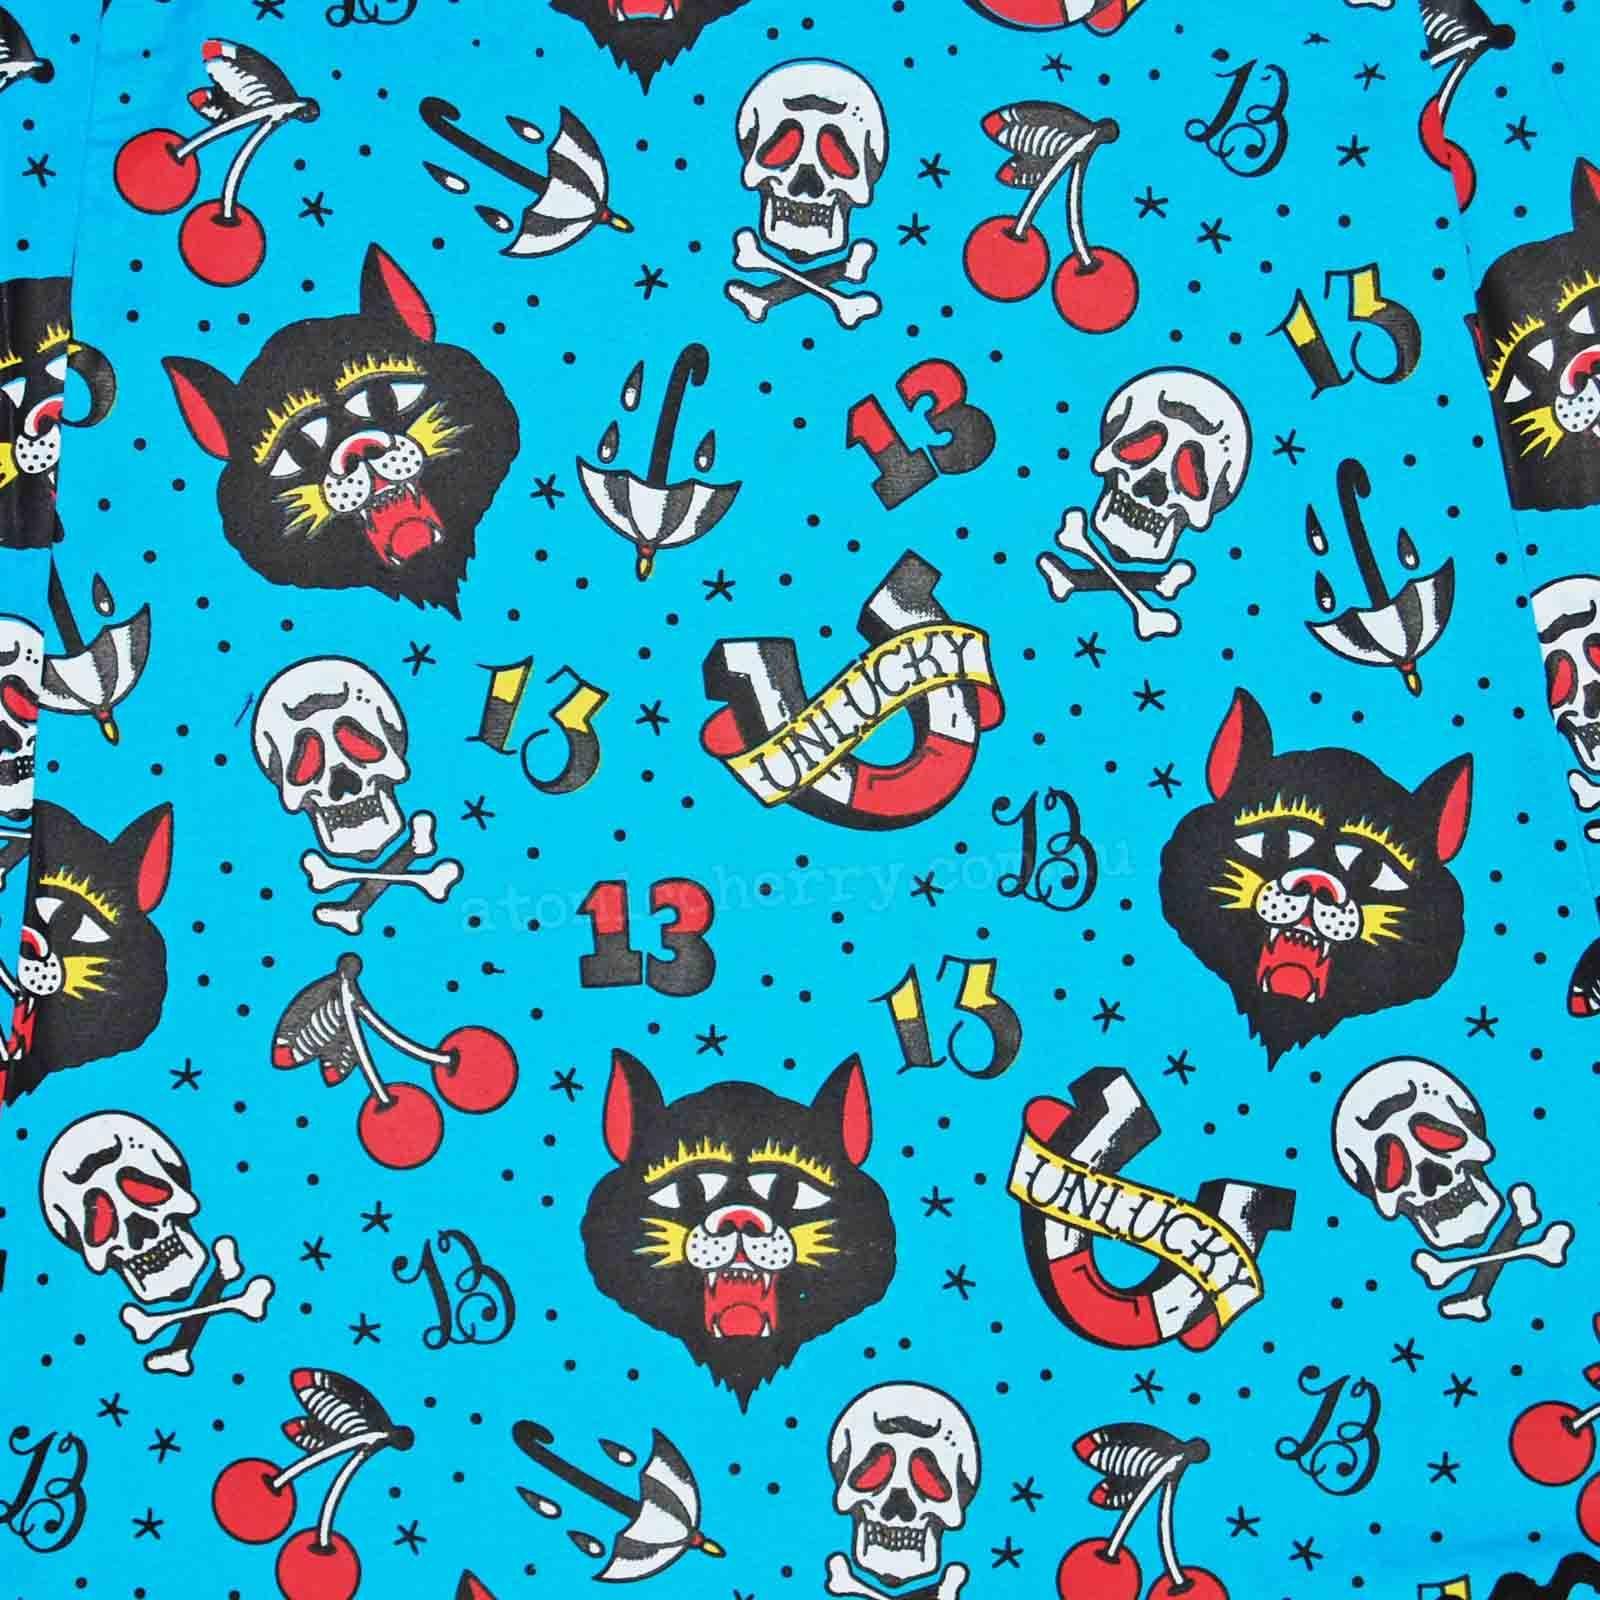 Rockabilly Wallpaper: Unlucky Tattoo Flash Rockabilly Halter Dress Pin Up Punk